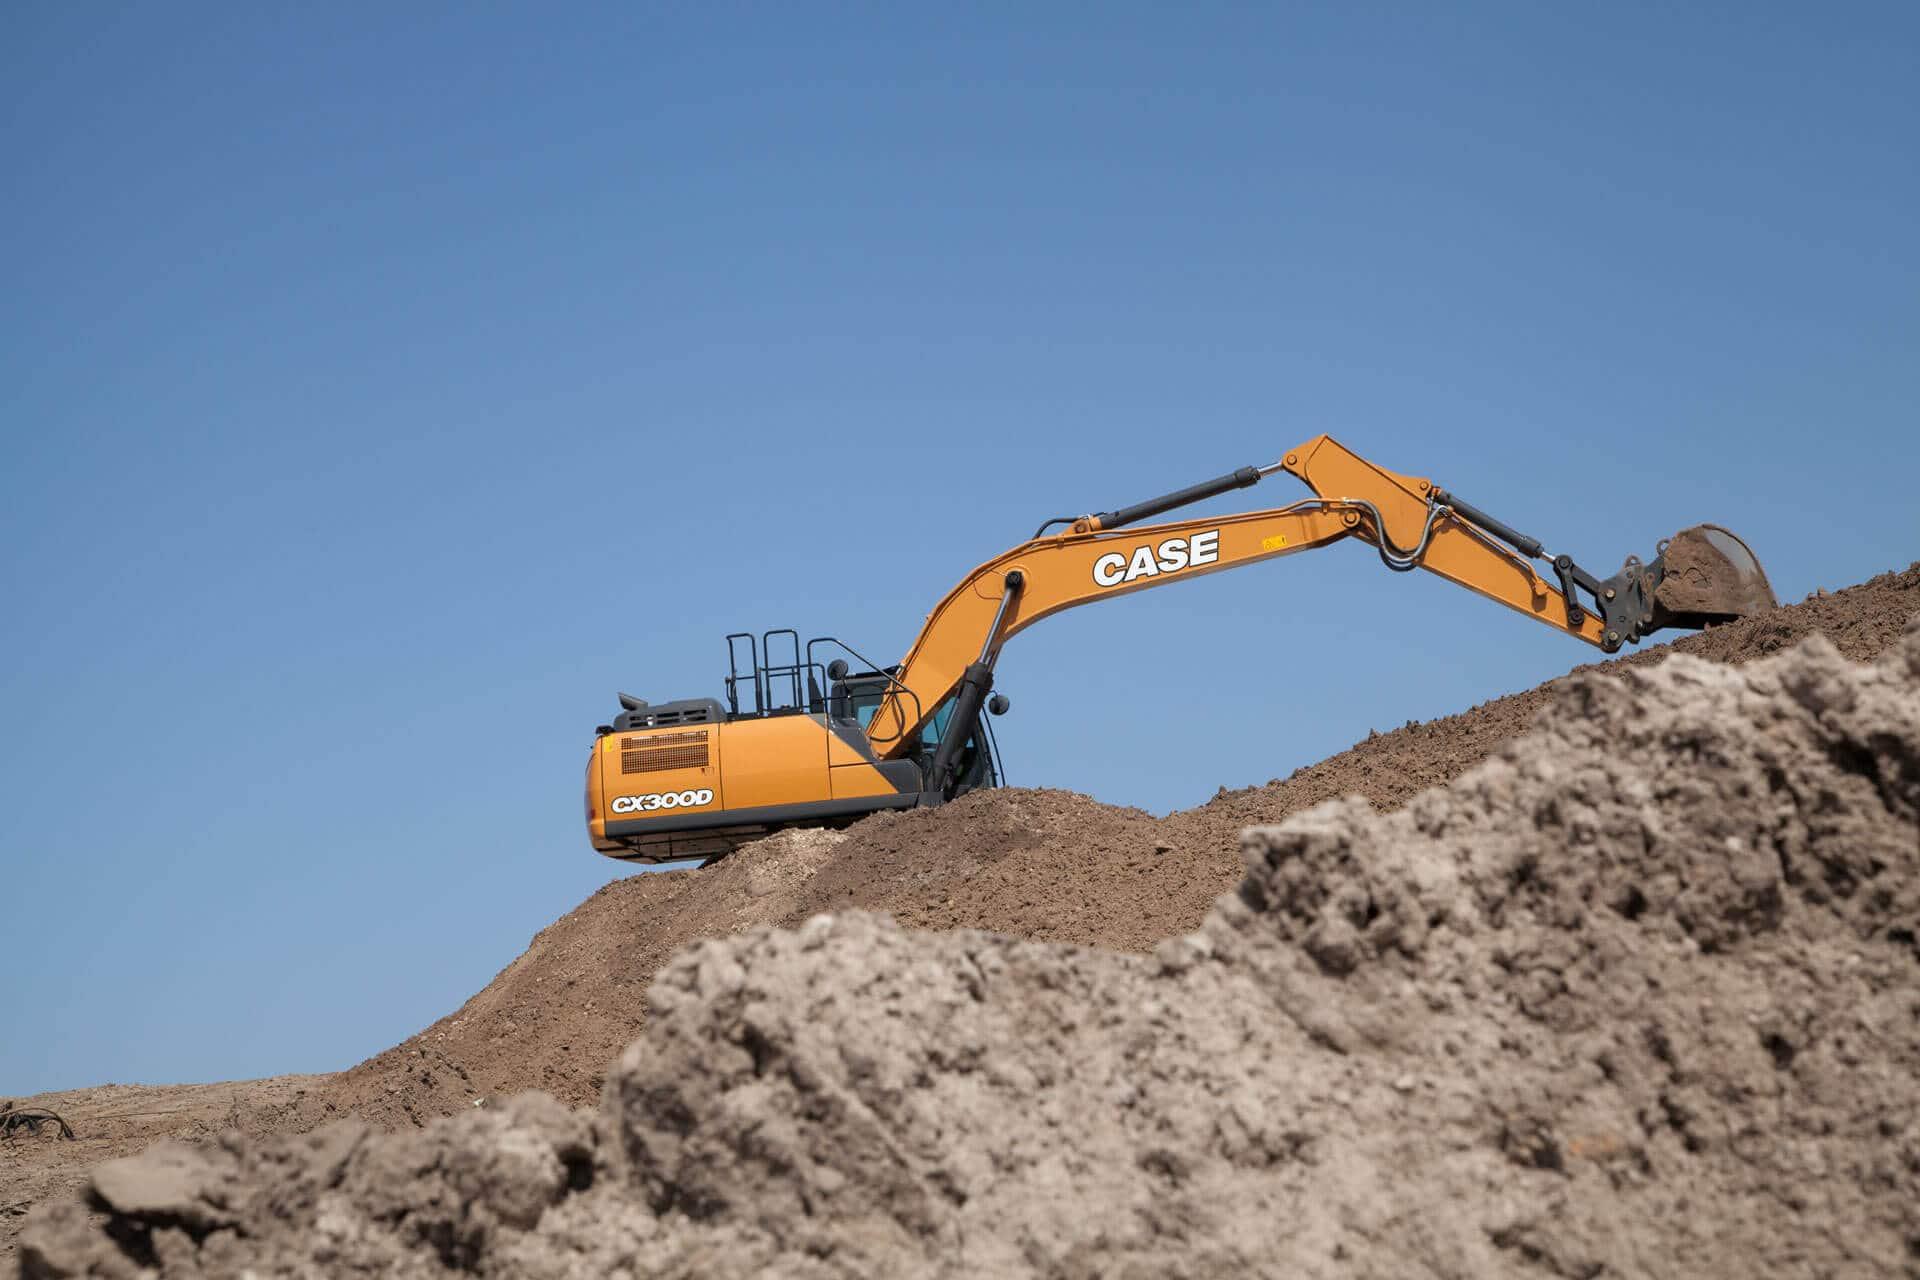 CASE CX300D Excavator | CASE Construction Equipment